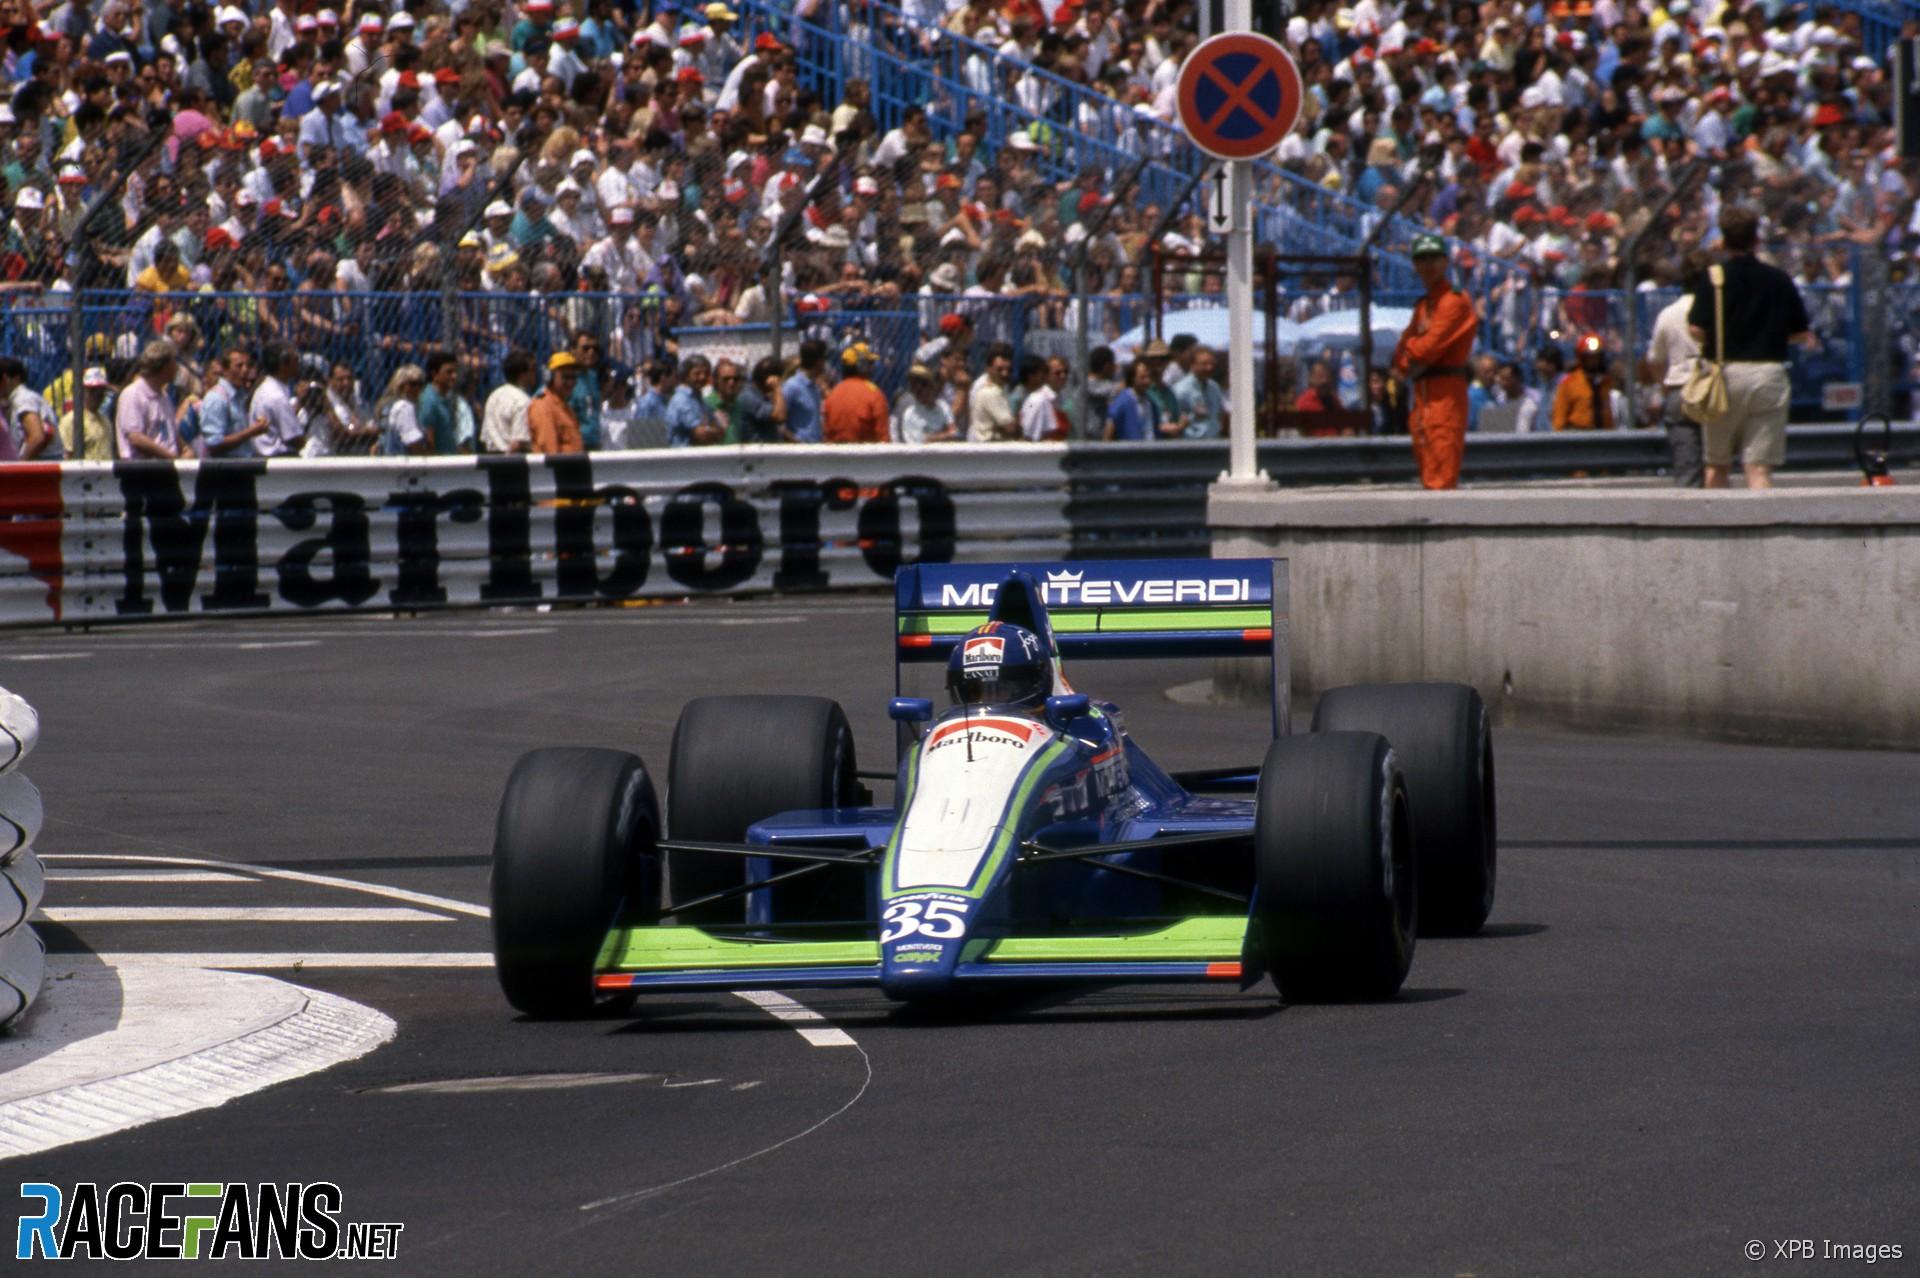 Gregor Foitek, Onyx, Monaco, 1990